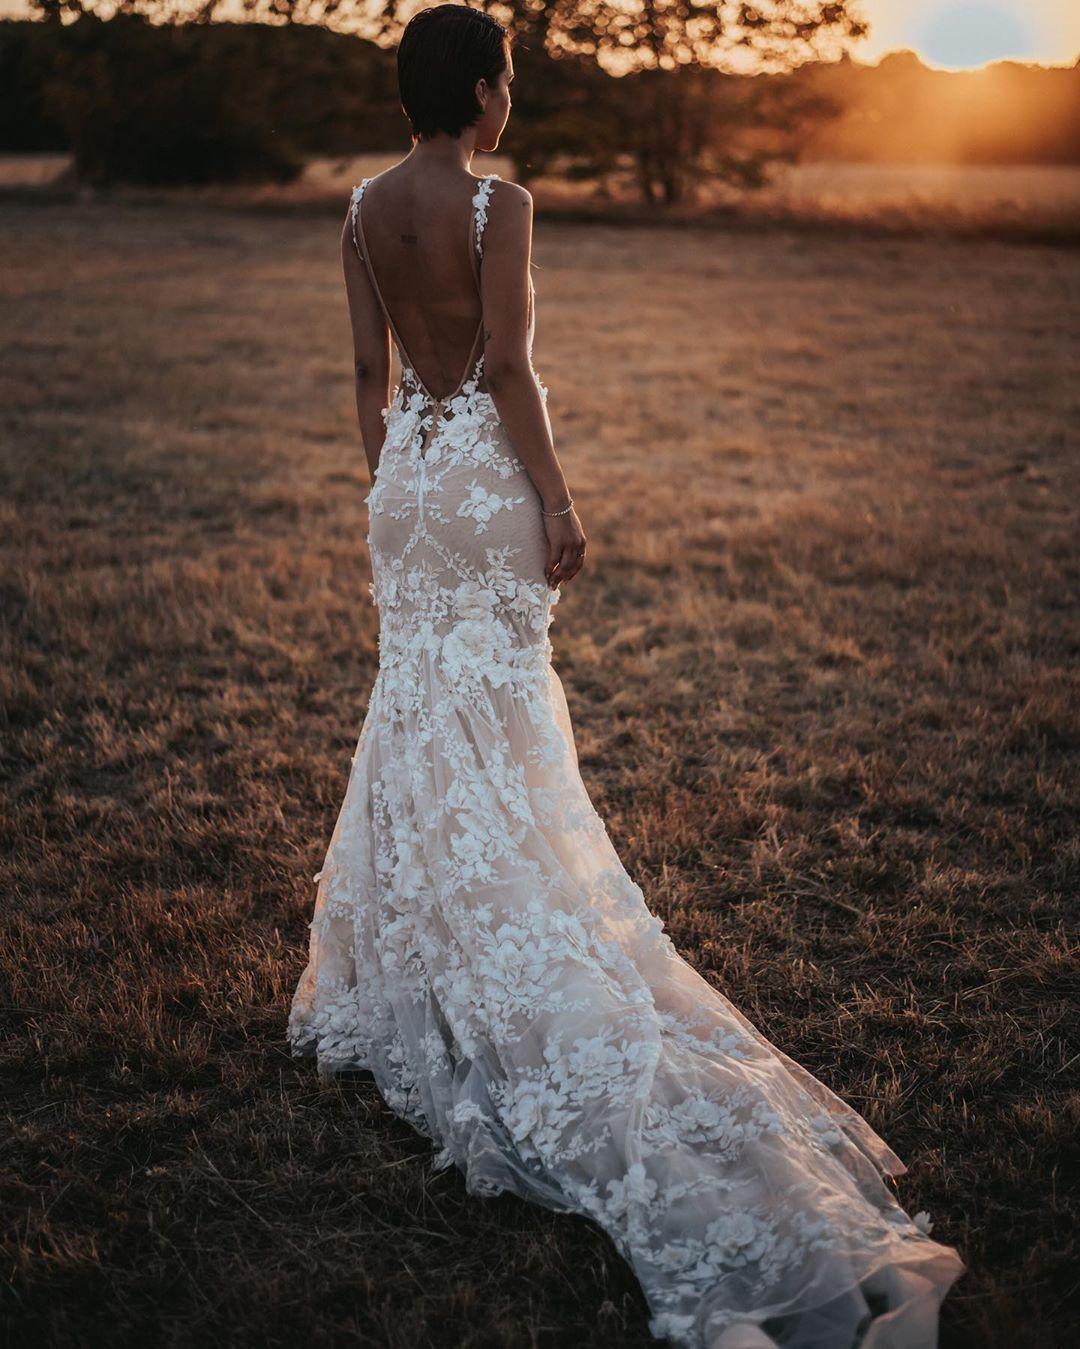 Galia Lahav Elegant Low Back Wedding Dress Wedding Dresses Elegant Wedding Dresses Lace Beach Wedding Dresses Backless [ 1349 x 1080 Pixel ]